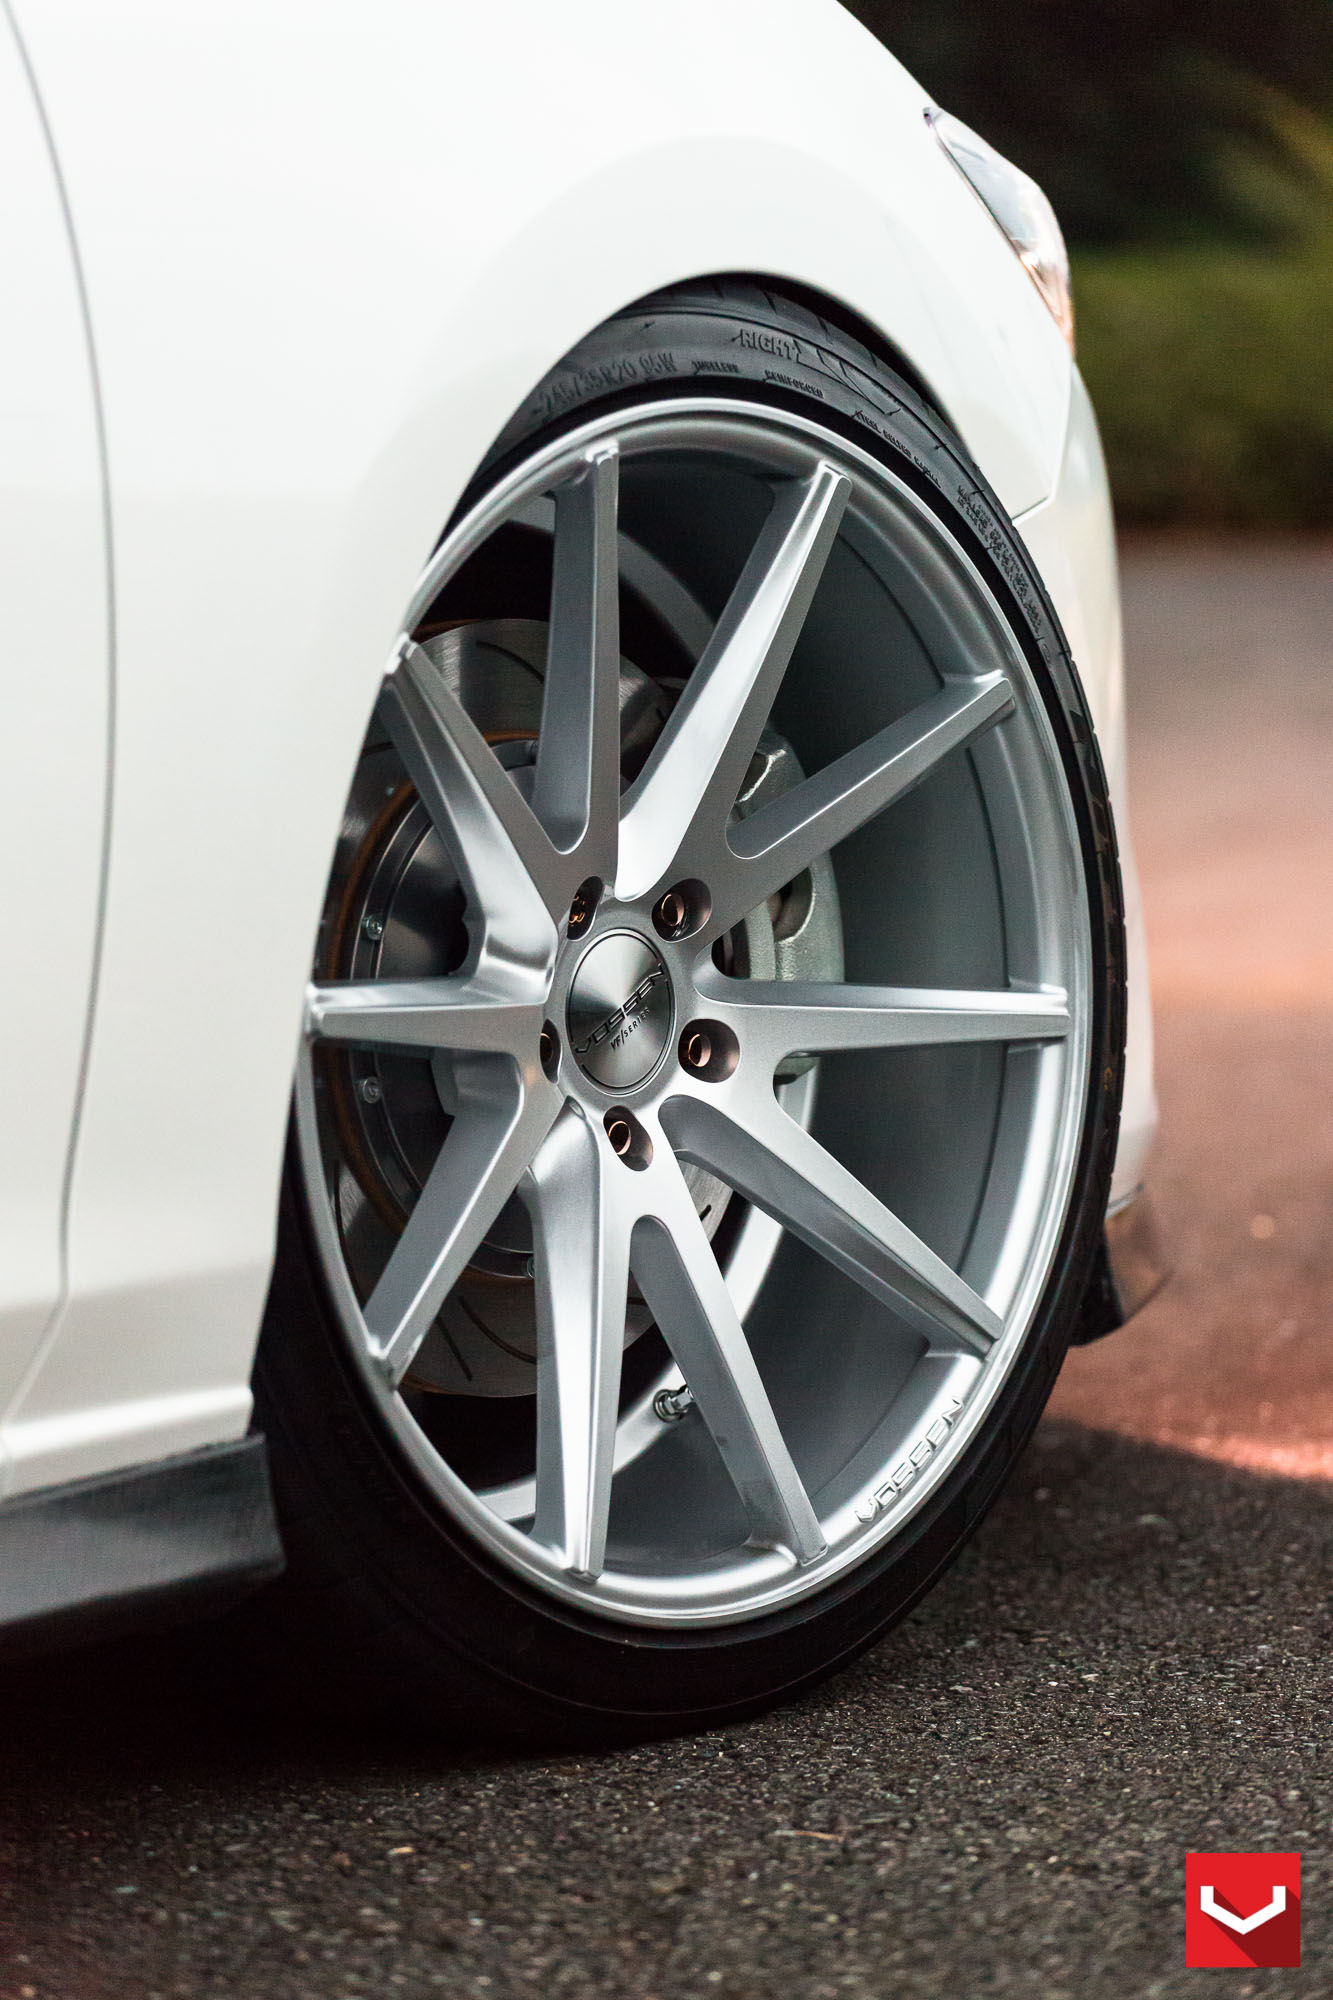 Mazda6 Gets Custom Vossen Wheels and Carbon Fiber Trim ...